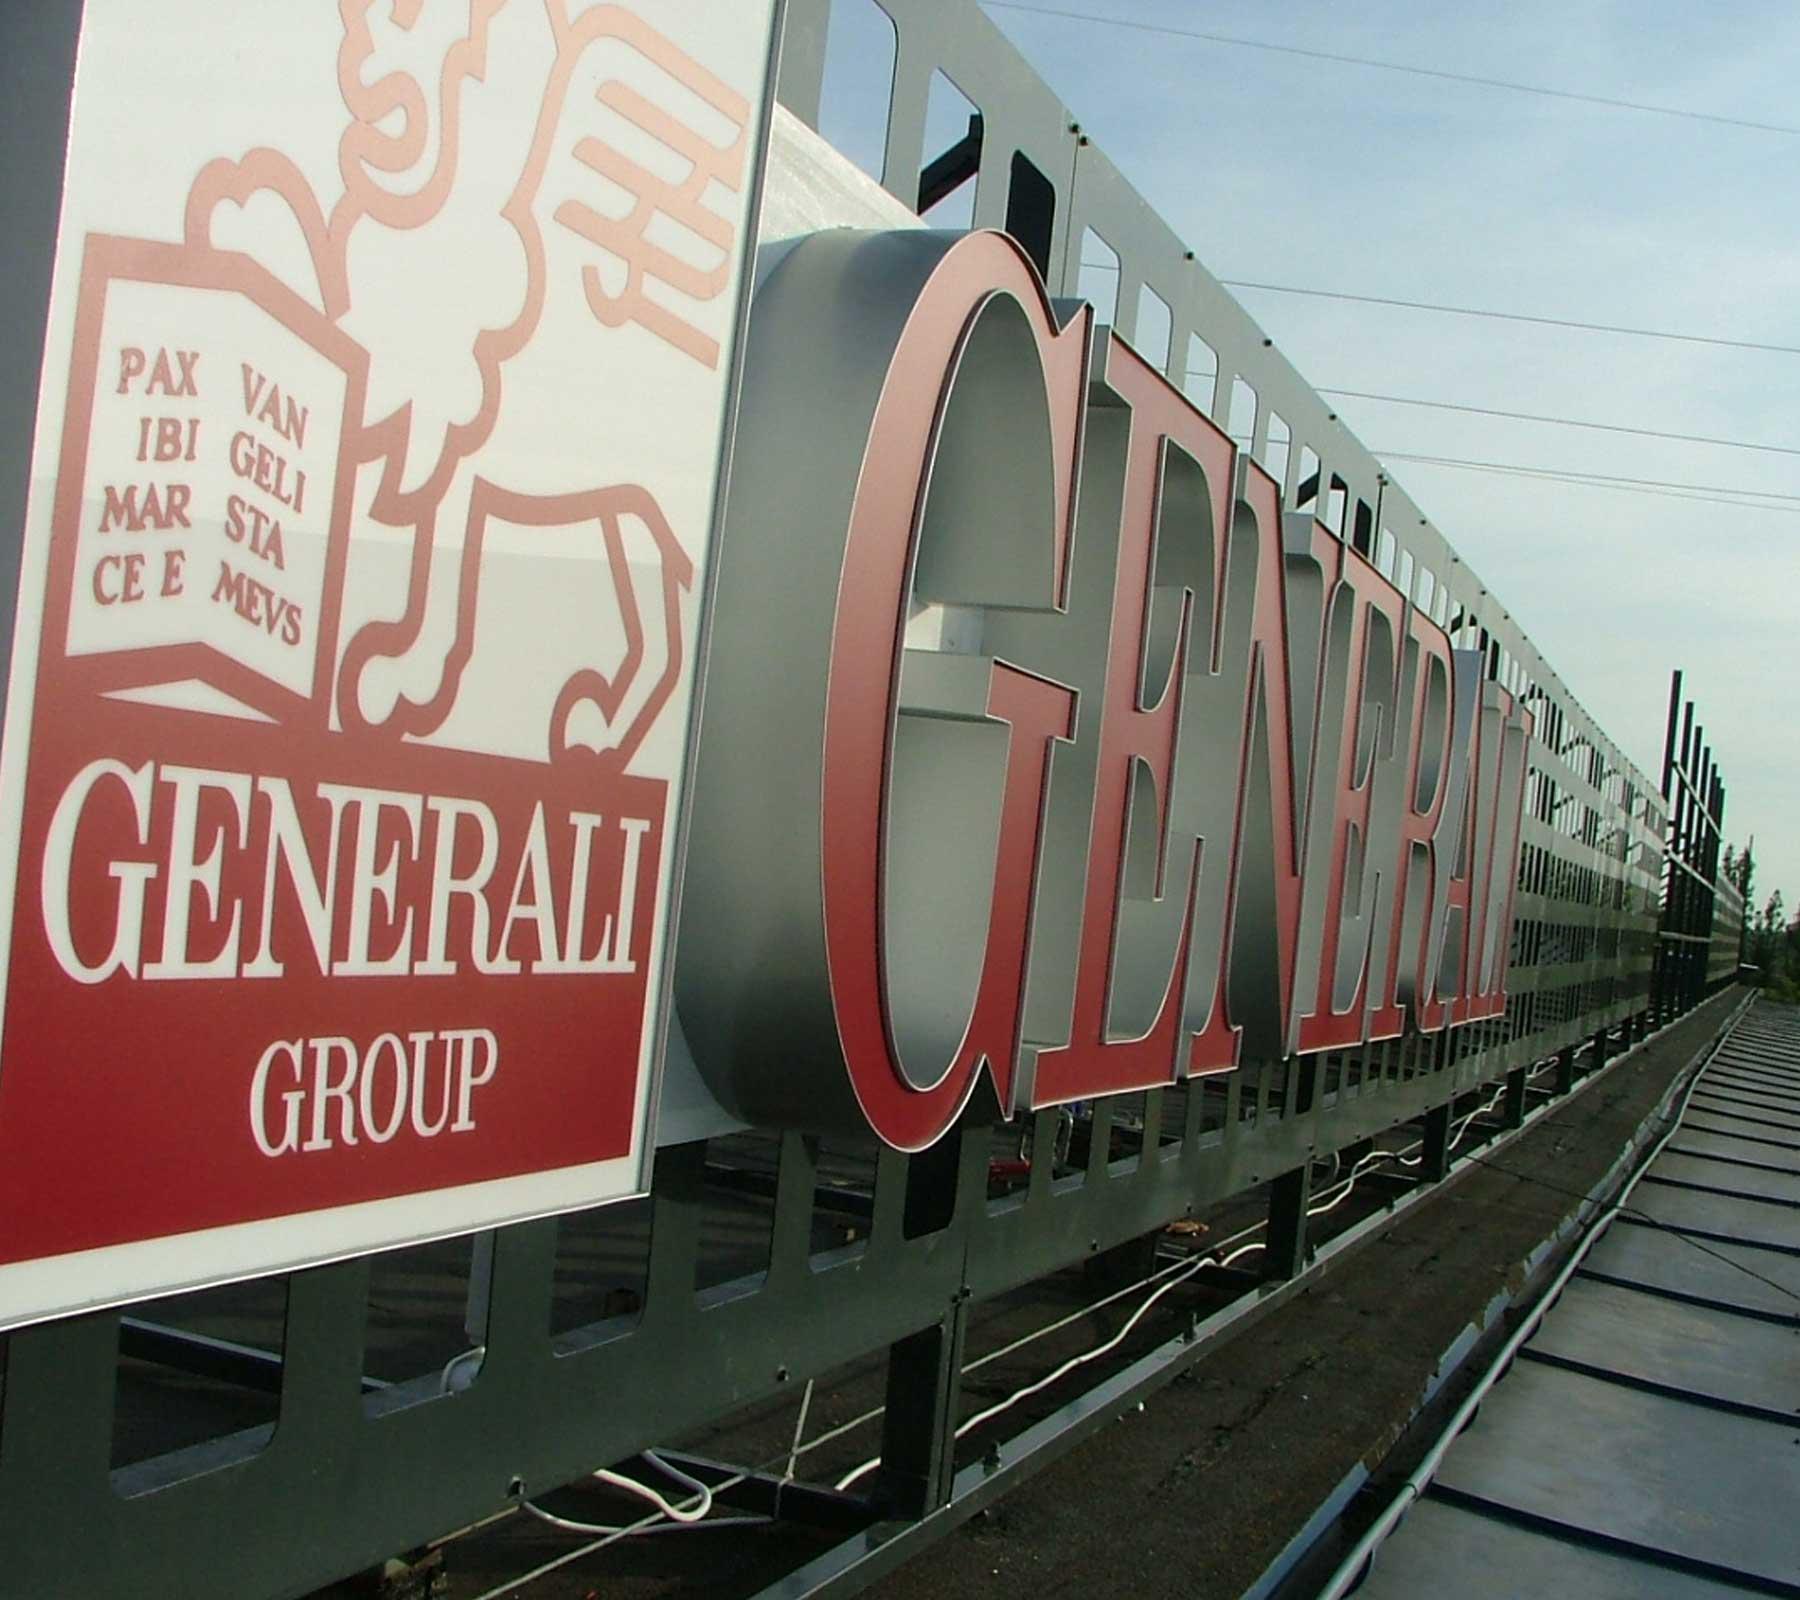 generali group